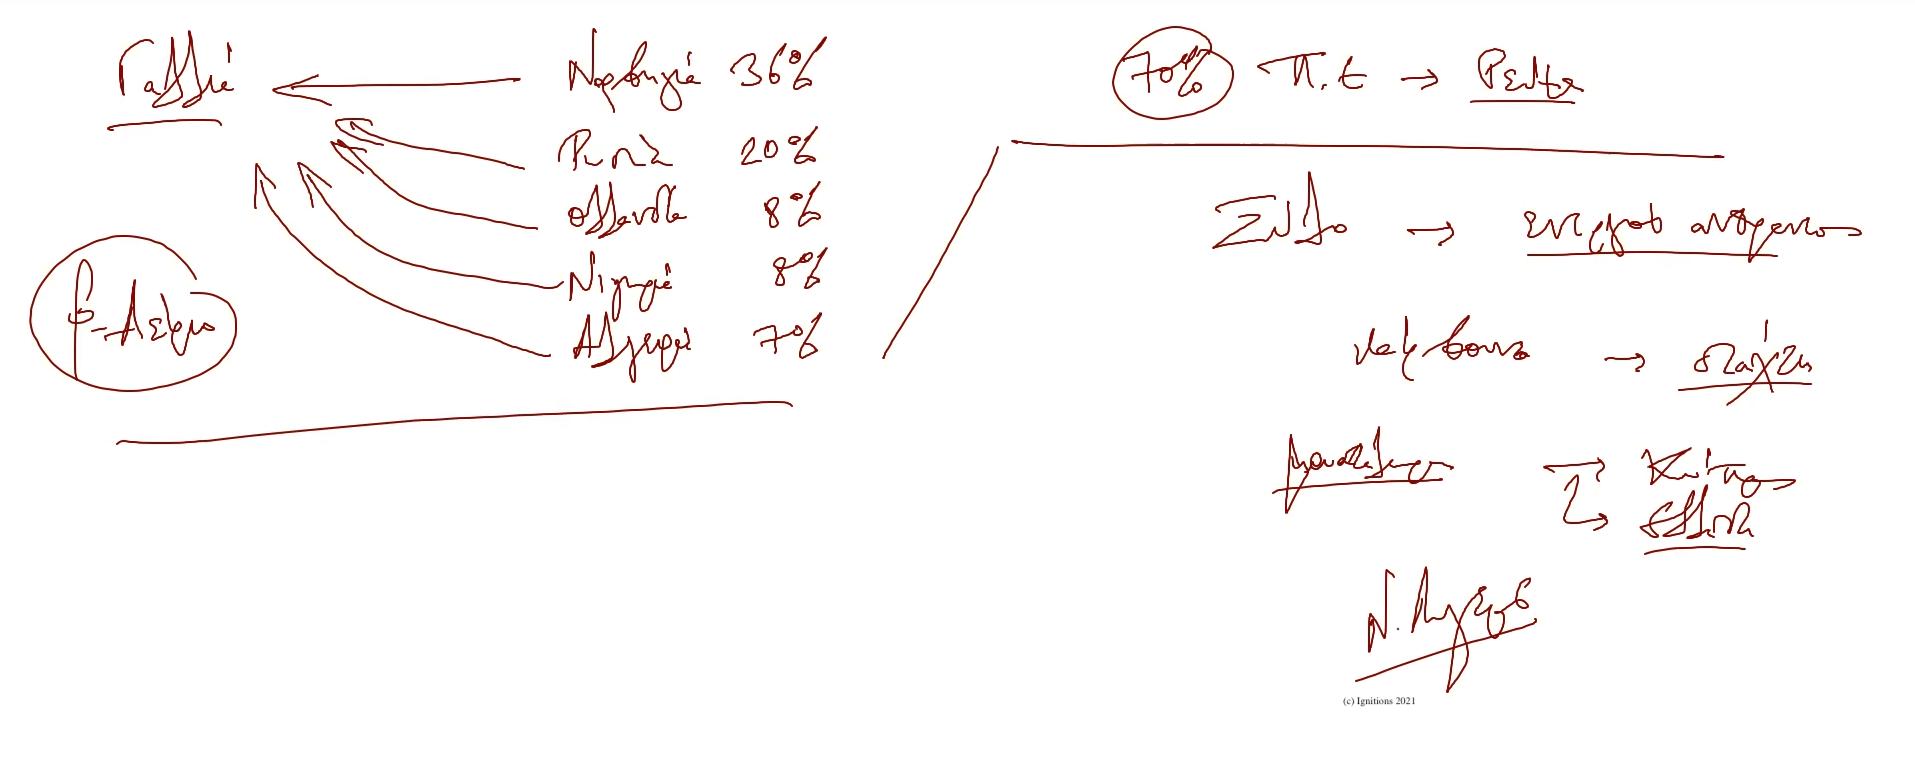 65116 - e-Μάθημα III: Ενεργειακά δεδομένα και Δράσεις. (Dessin)